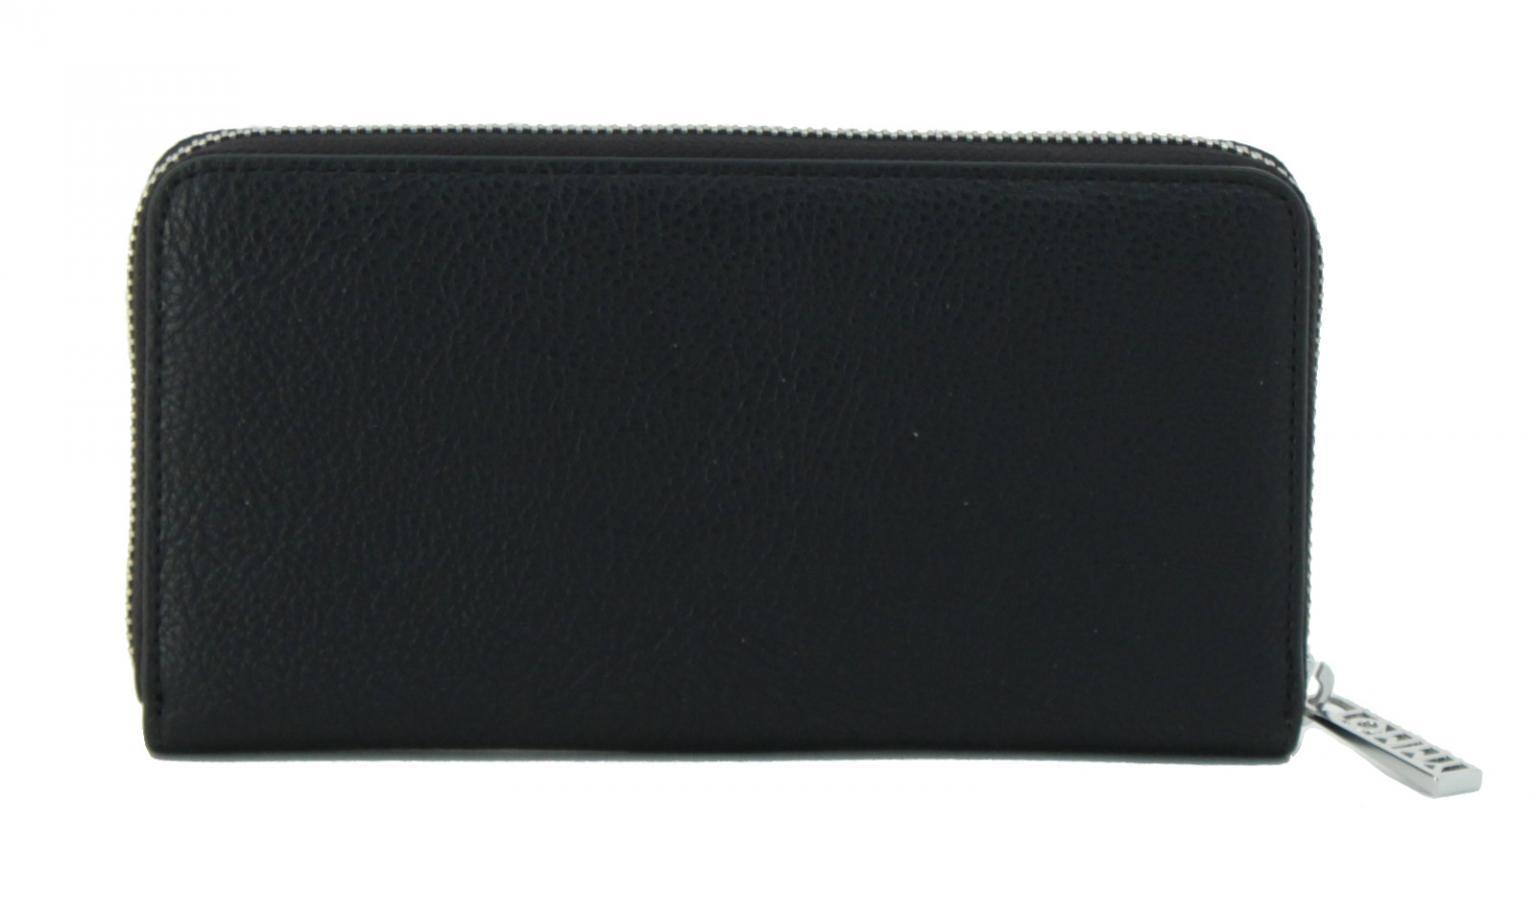 Portemonnaie Tommy Hilfiger TH Core LRG schwarz grau